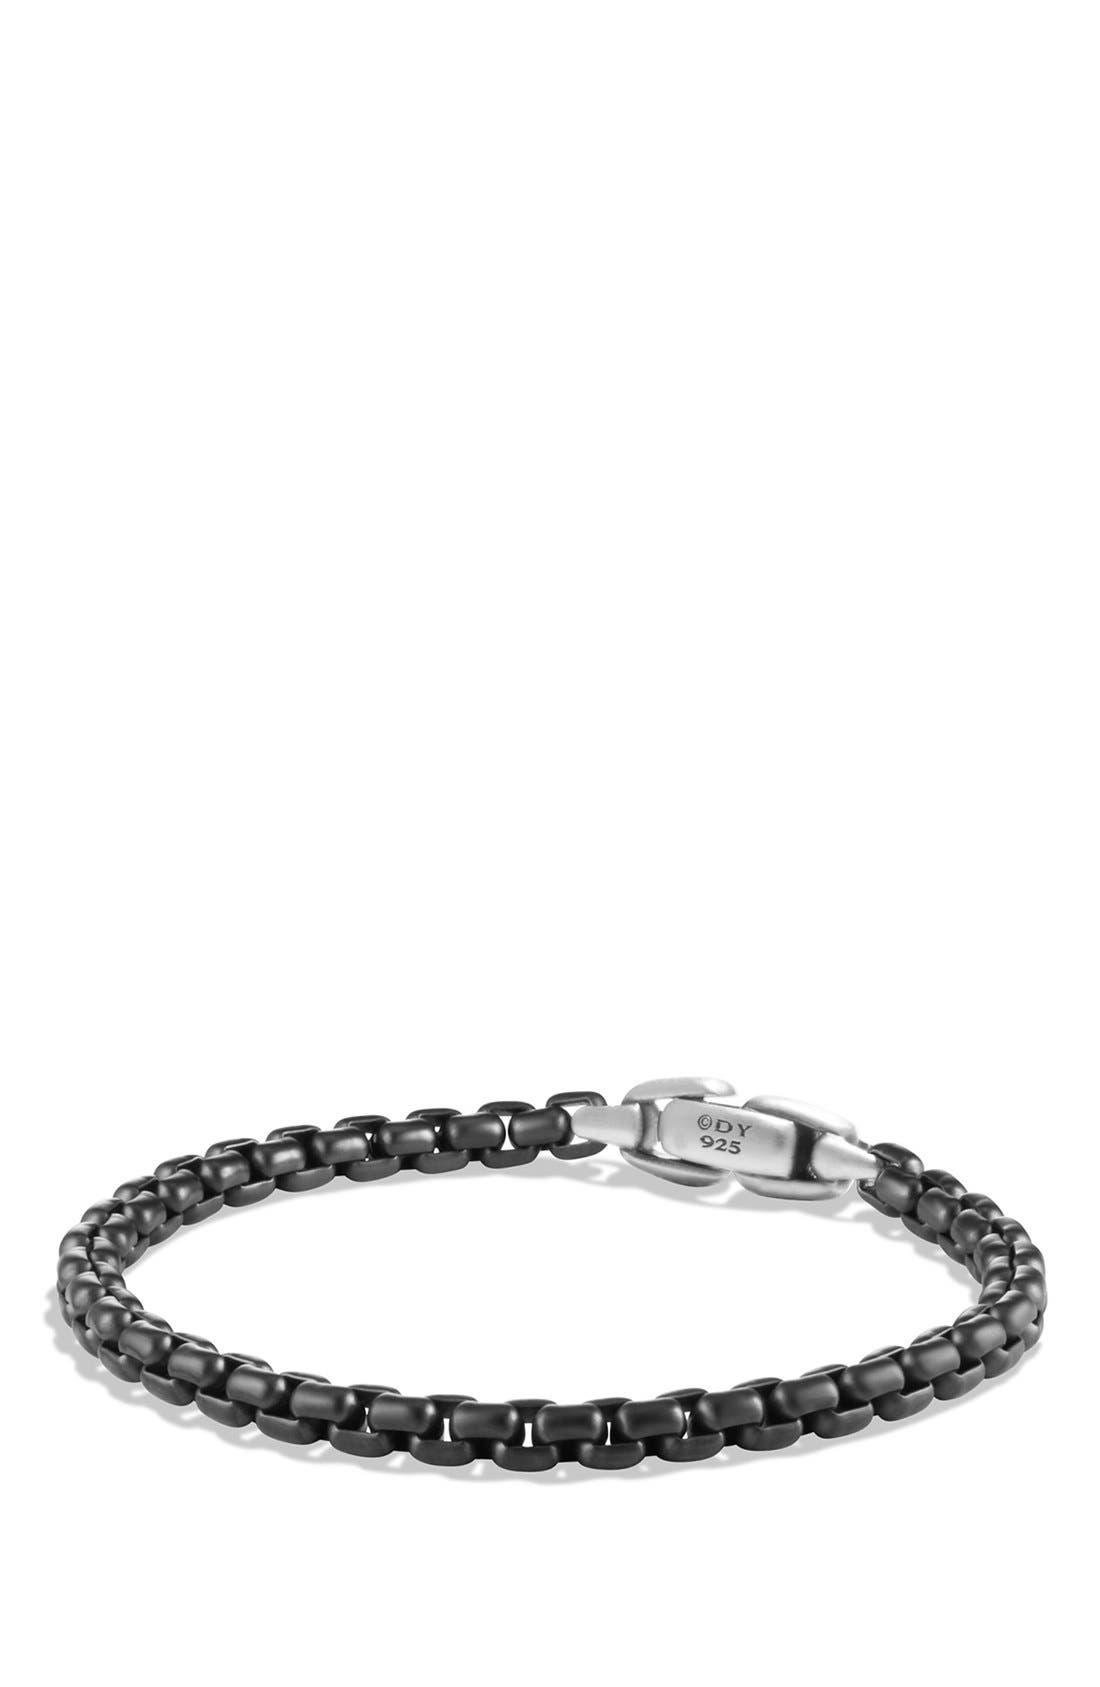 Alternate Image 1 Selected - David Yurman Box Chain Bracelet